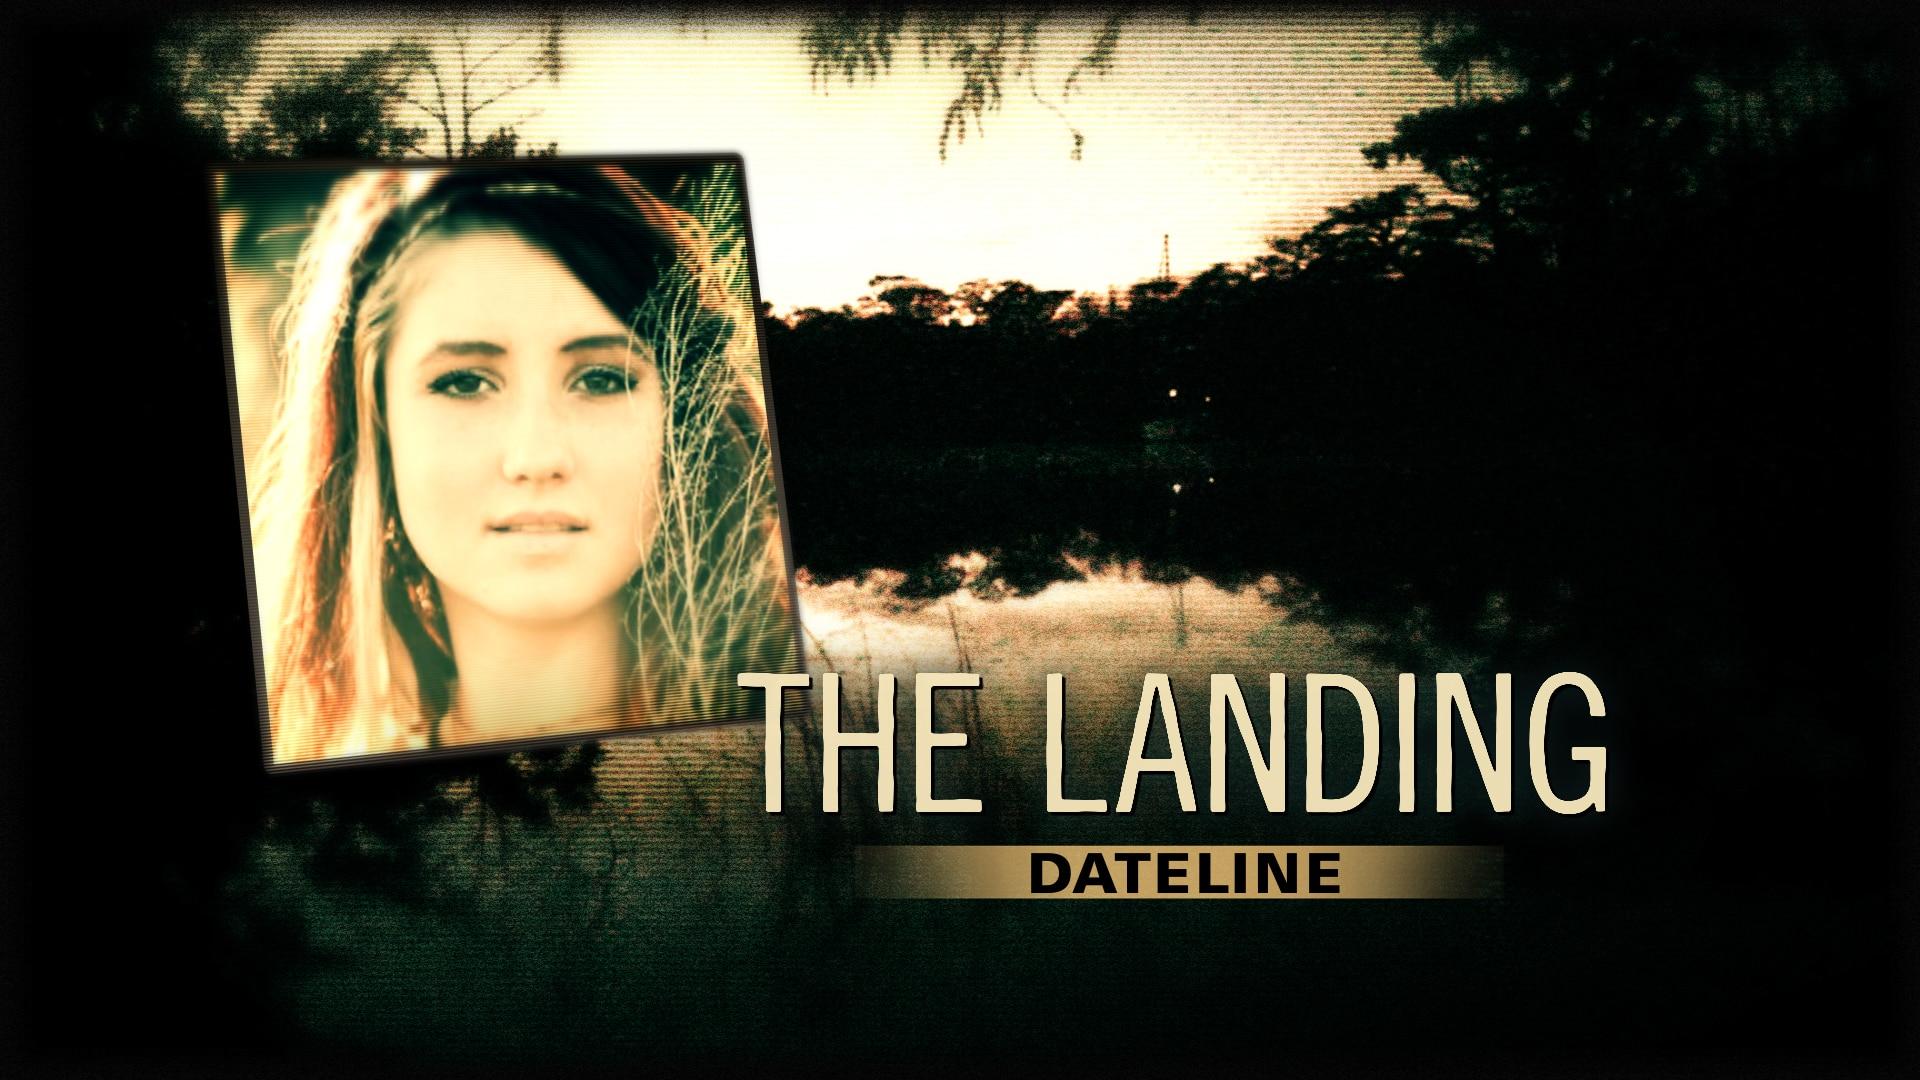 Watch Dateline Episode: The Landing - NBC.com